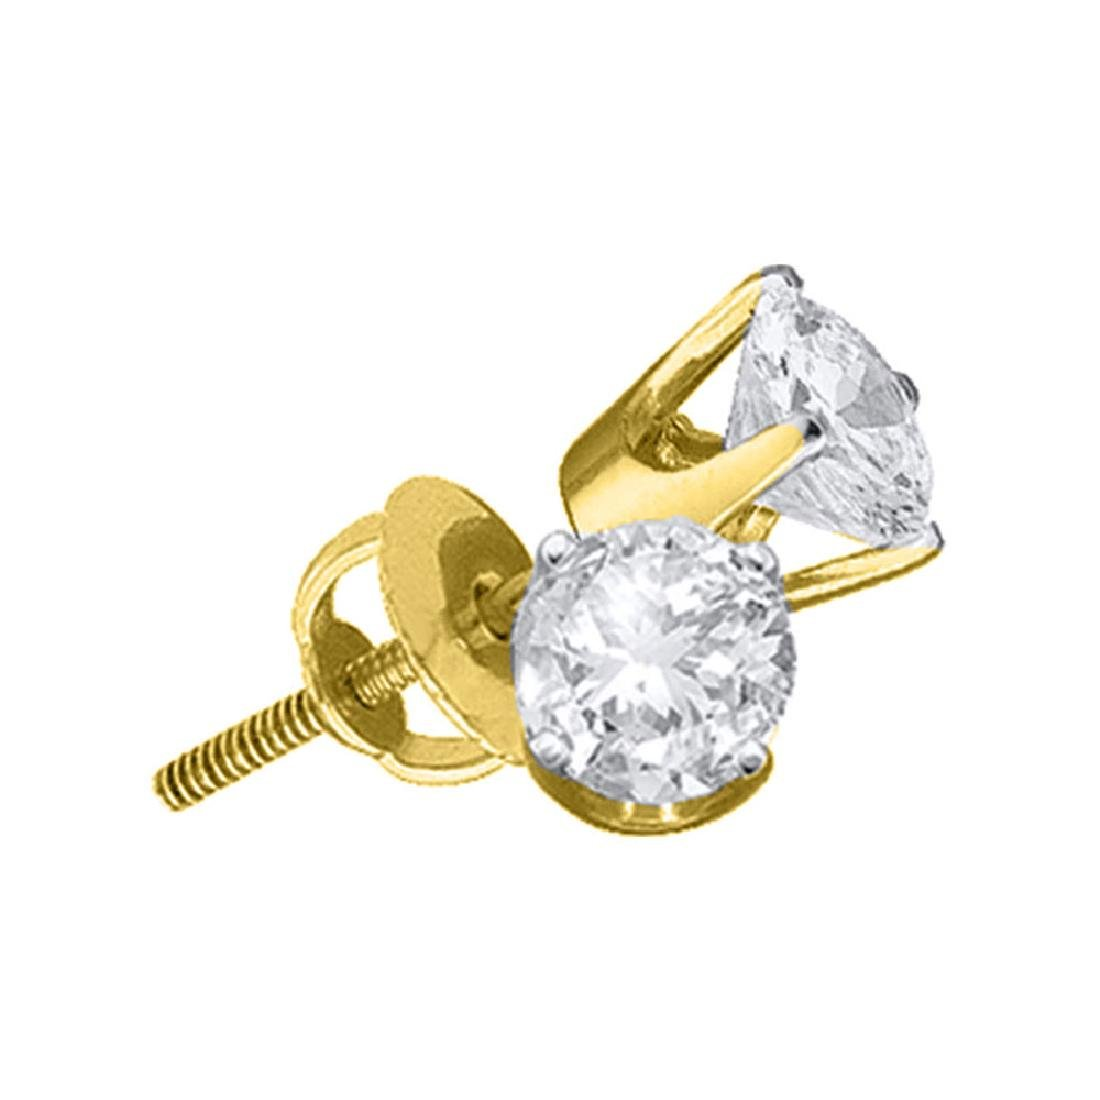 1.42 CTW Diamond Solitaire Stud Earrings 14KT Yellow